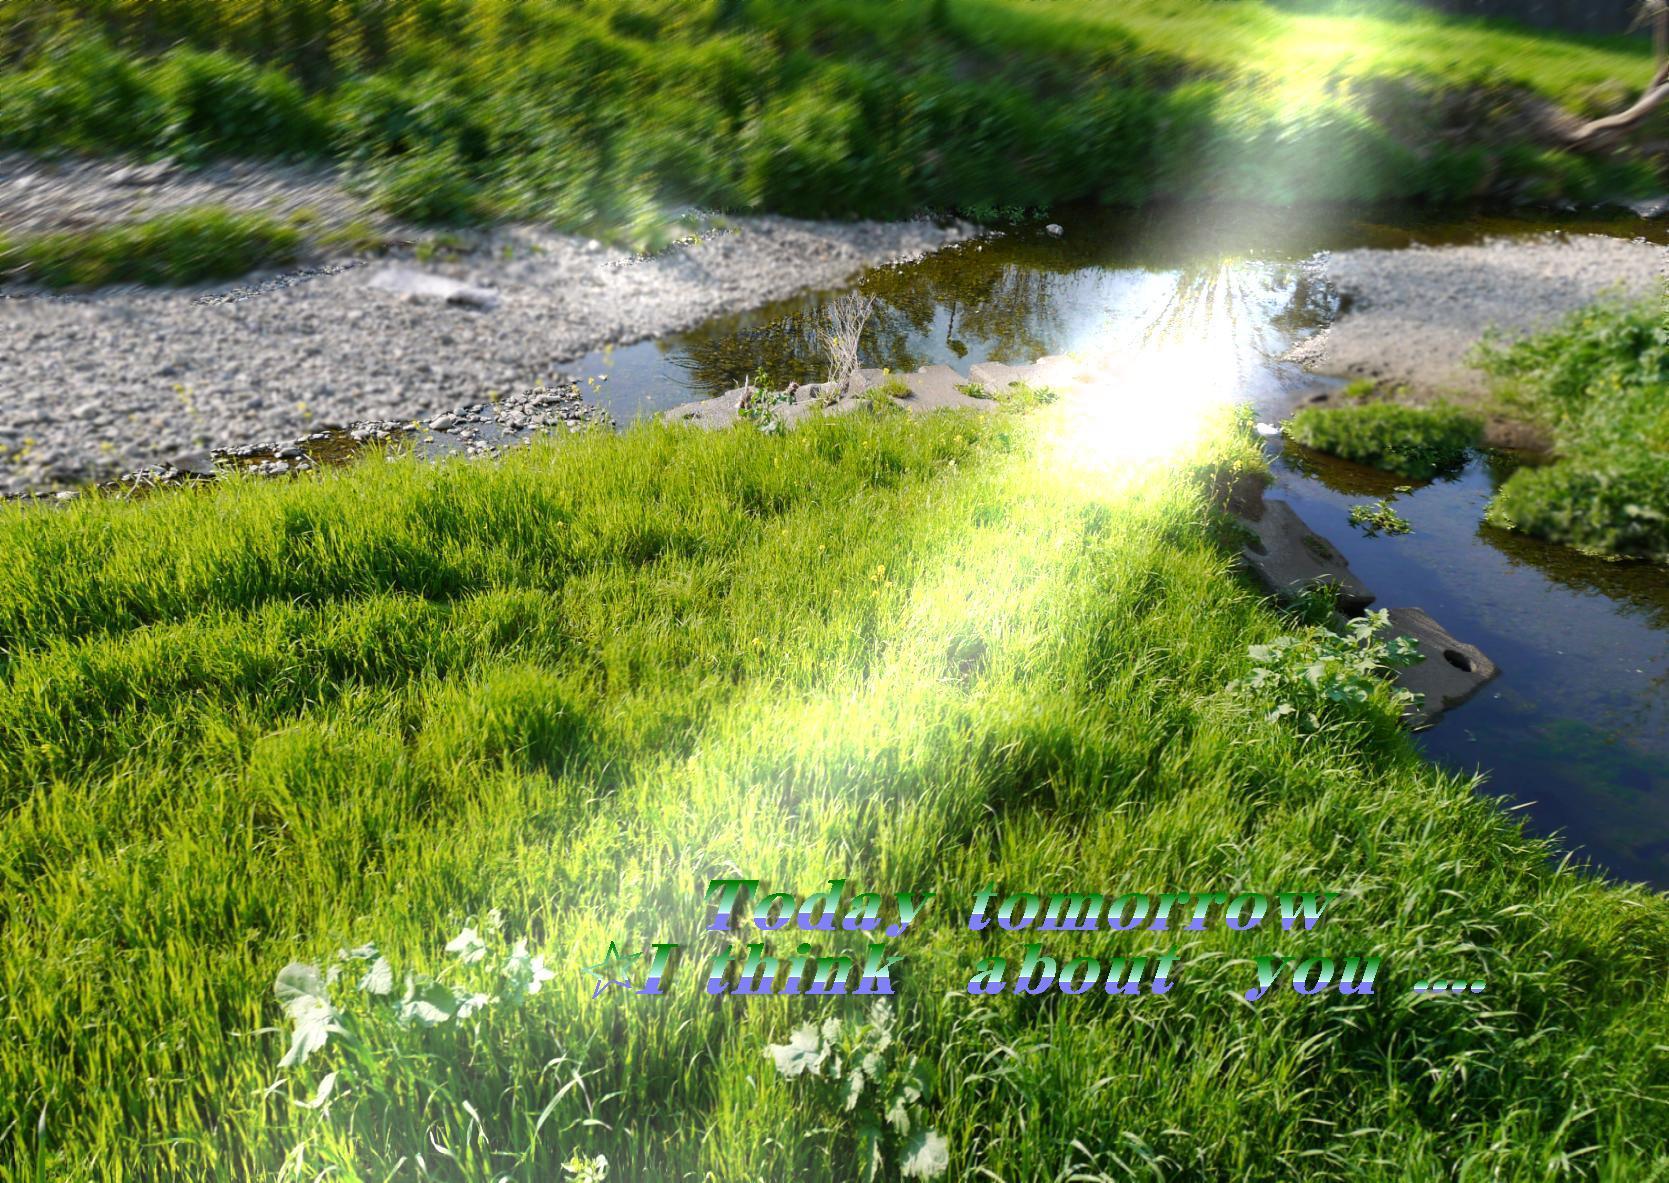 c0311178_15114310.jpg